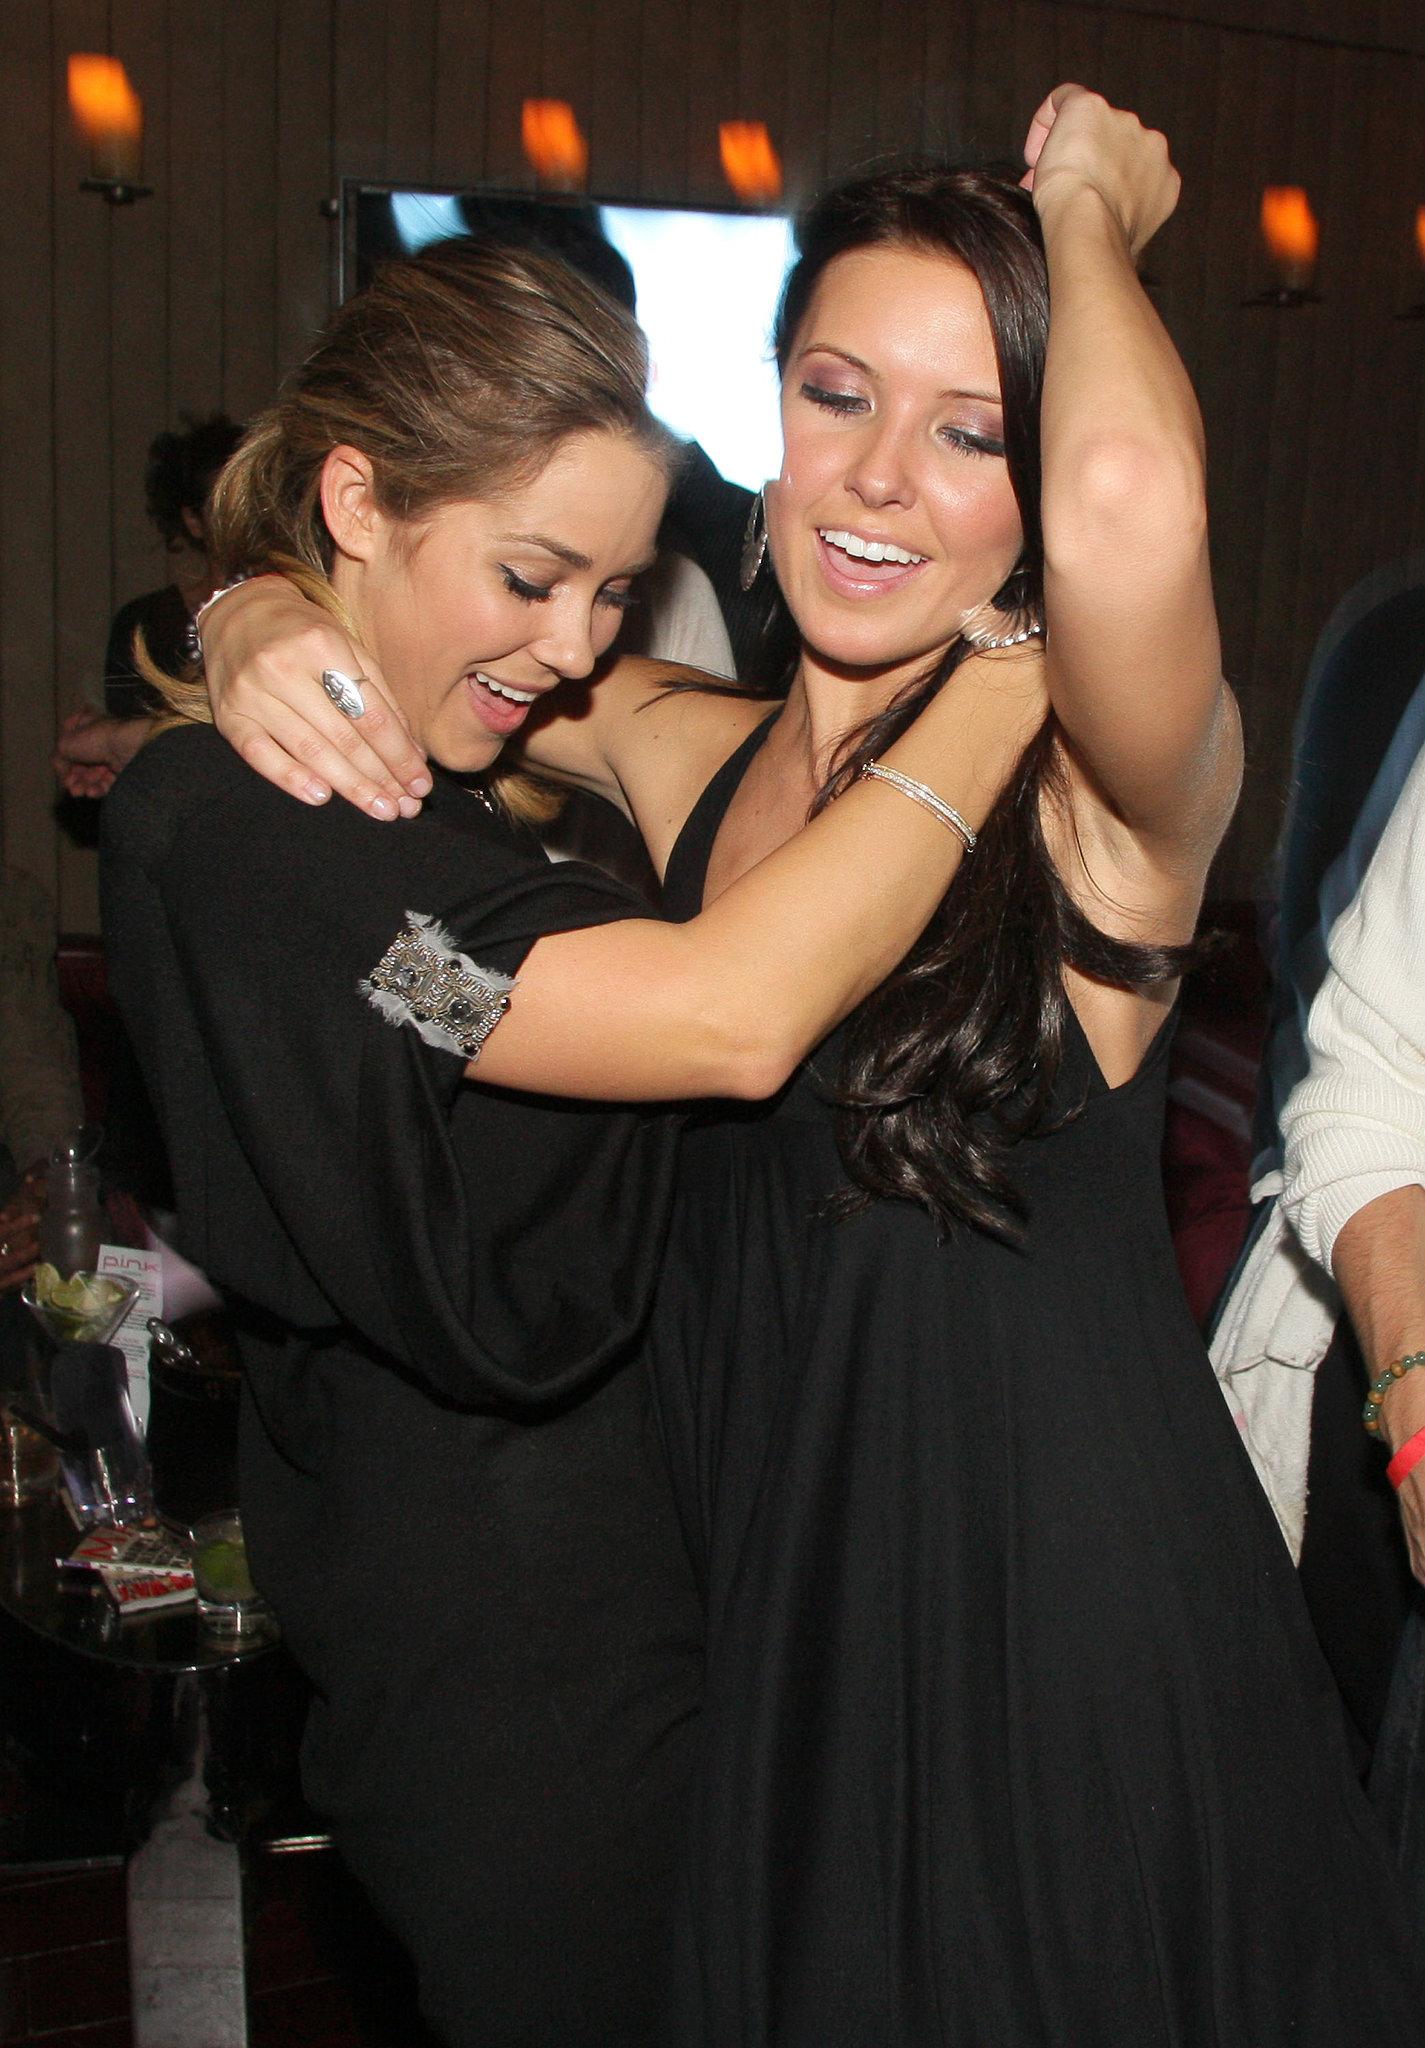 Lauren Conrad danced with Audrina Patridge at an LA bash in November 2007.